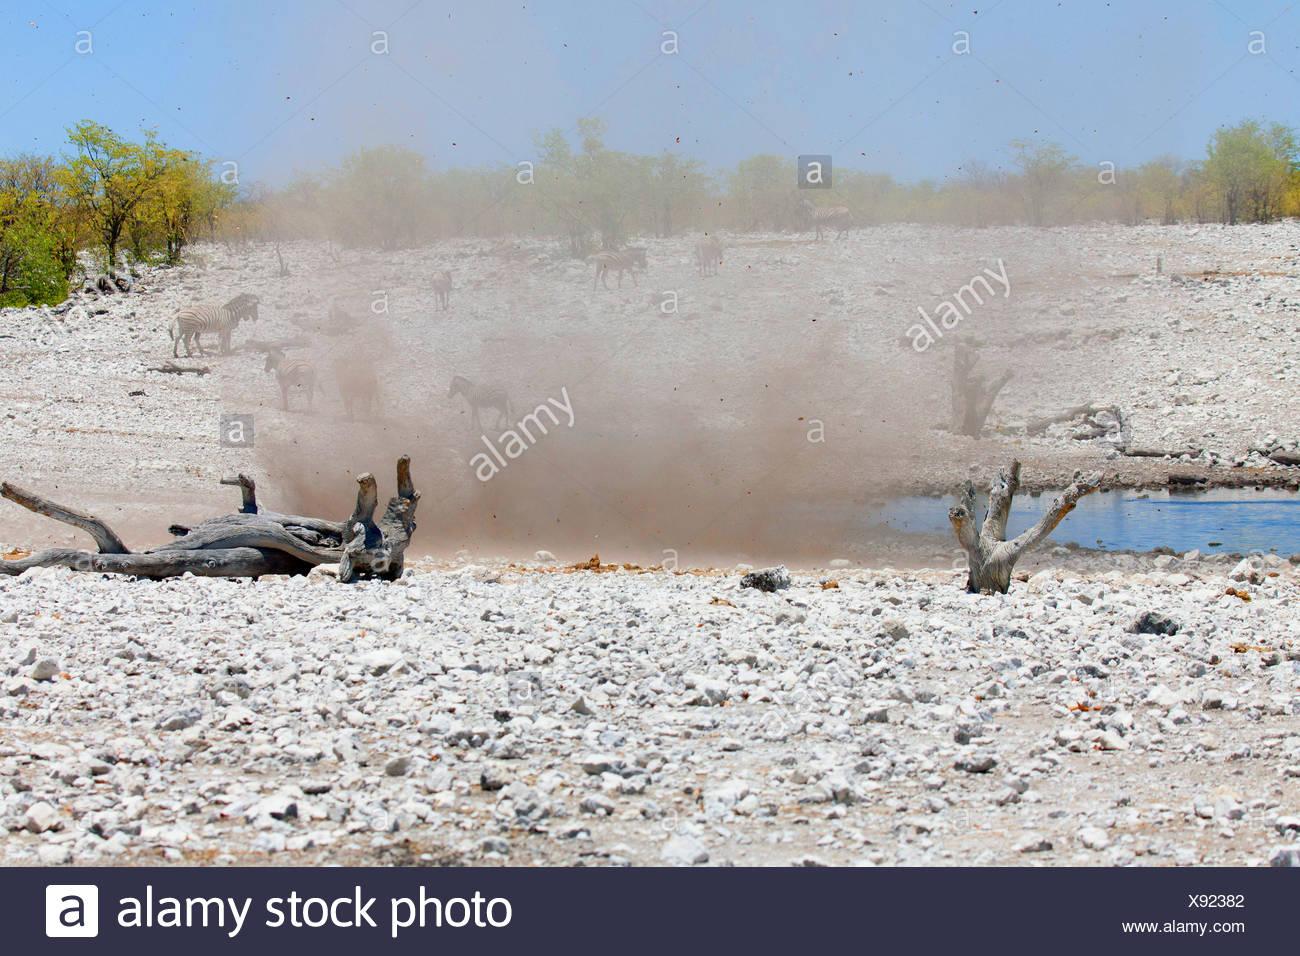 dust devil whirling up sand and stones near a waterhole with zebras, Namibia, Etosha National Park, Naumutoni - Stock Image